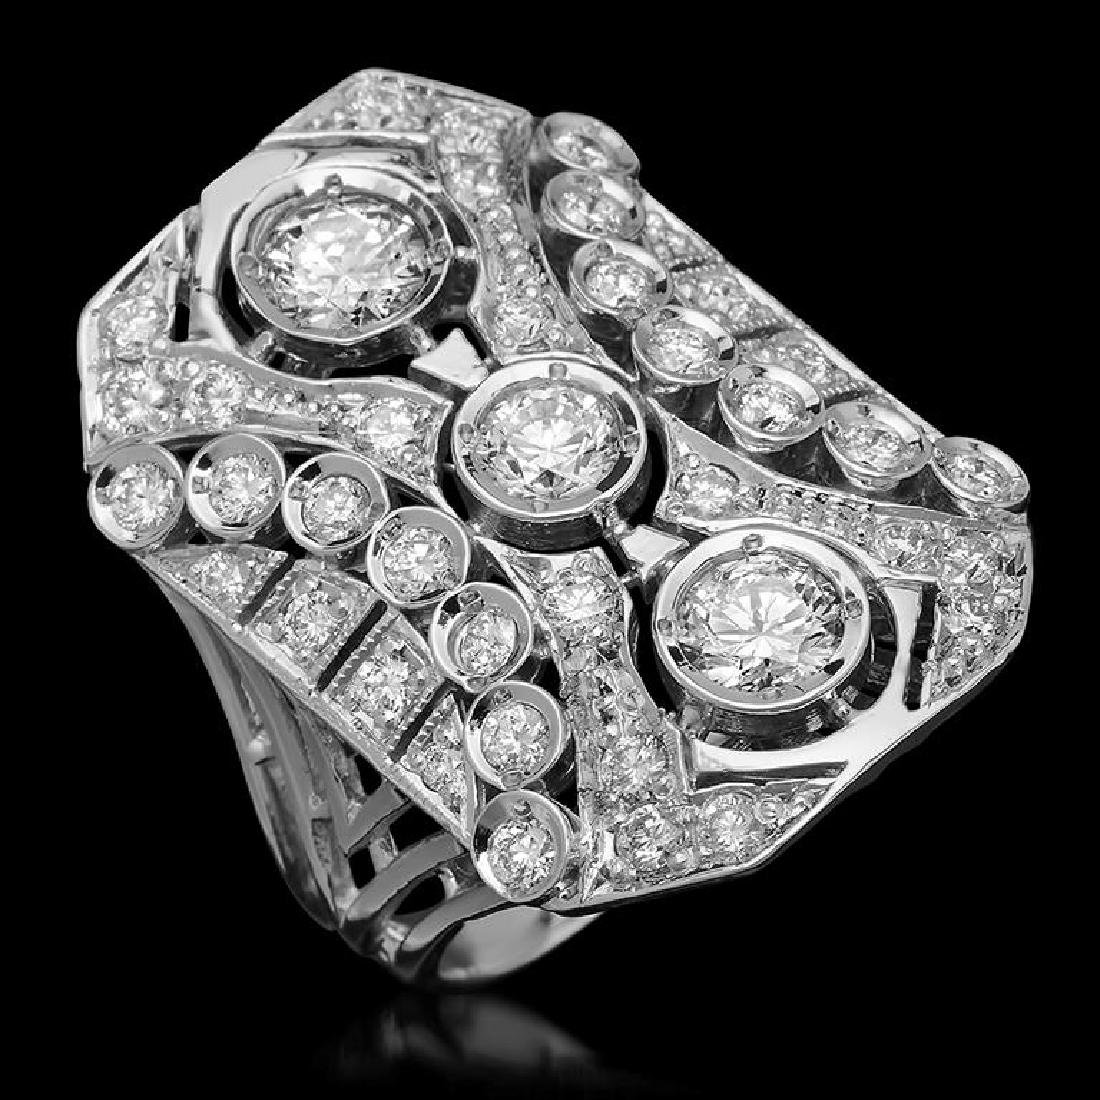 14K Gold 2.52ct Diamond Ring